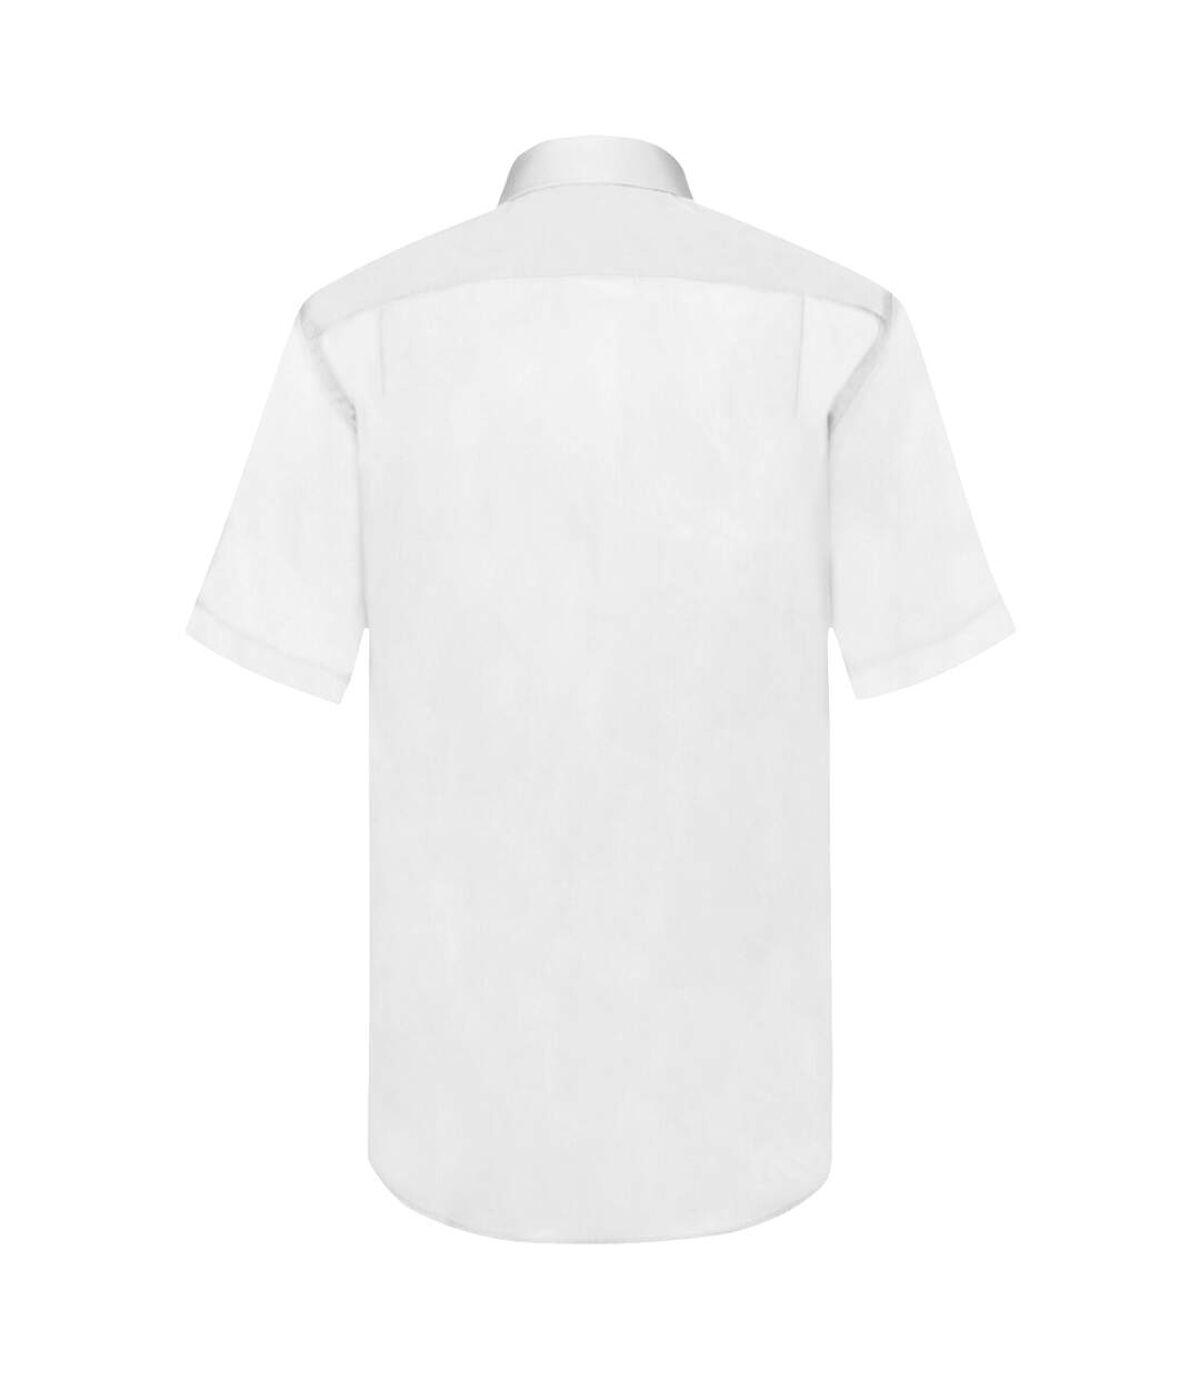 Fruit Of The Loom Mens Short Sleeve Poplin Shirt (White) - UTBC404